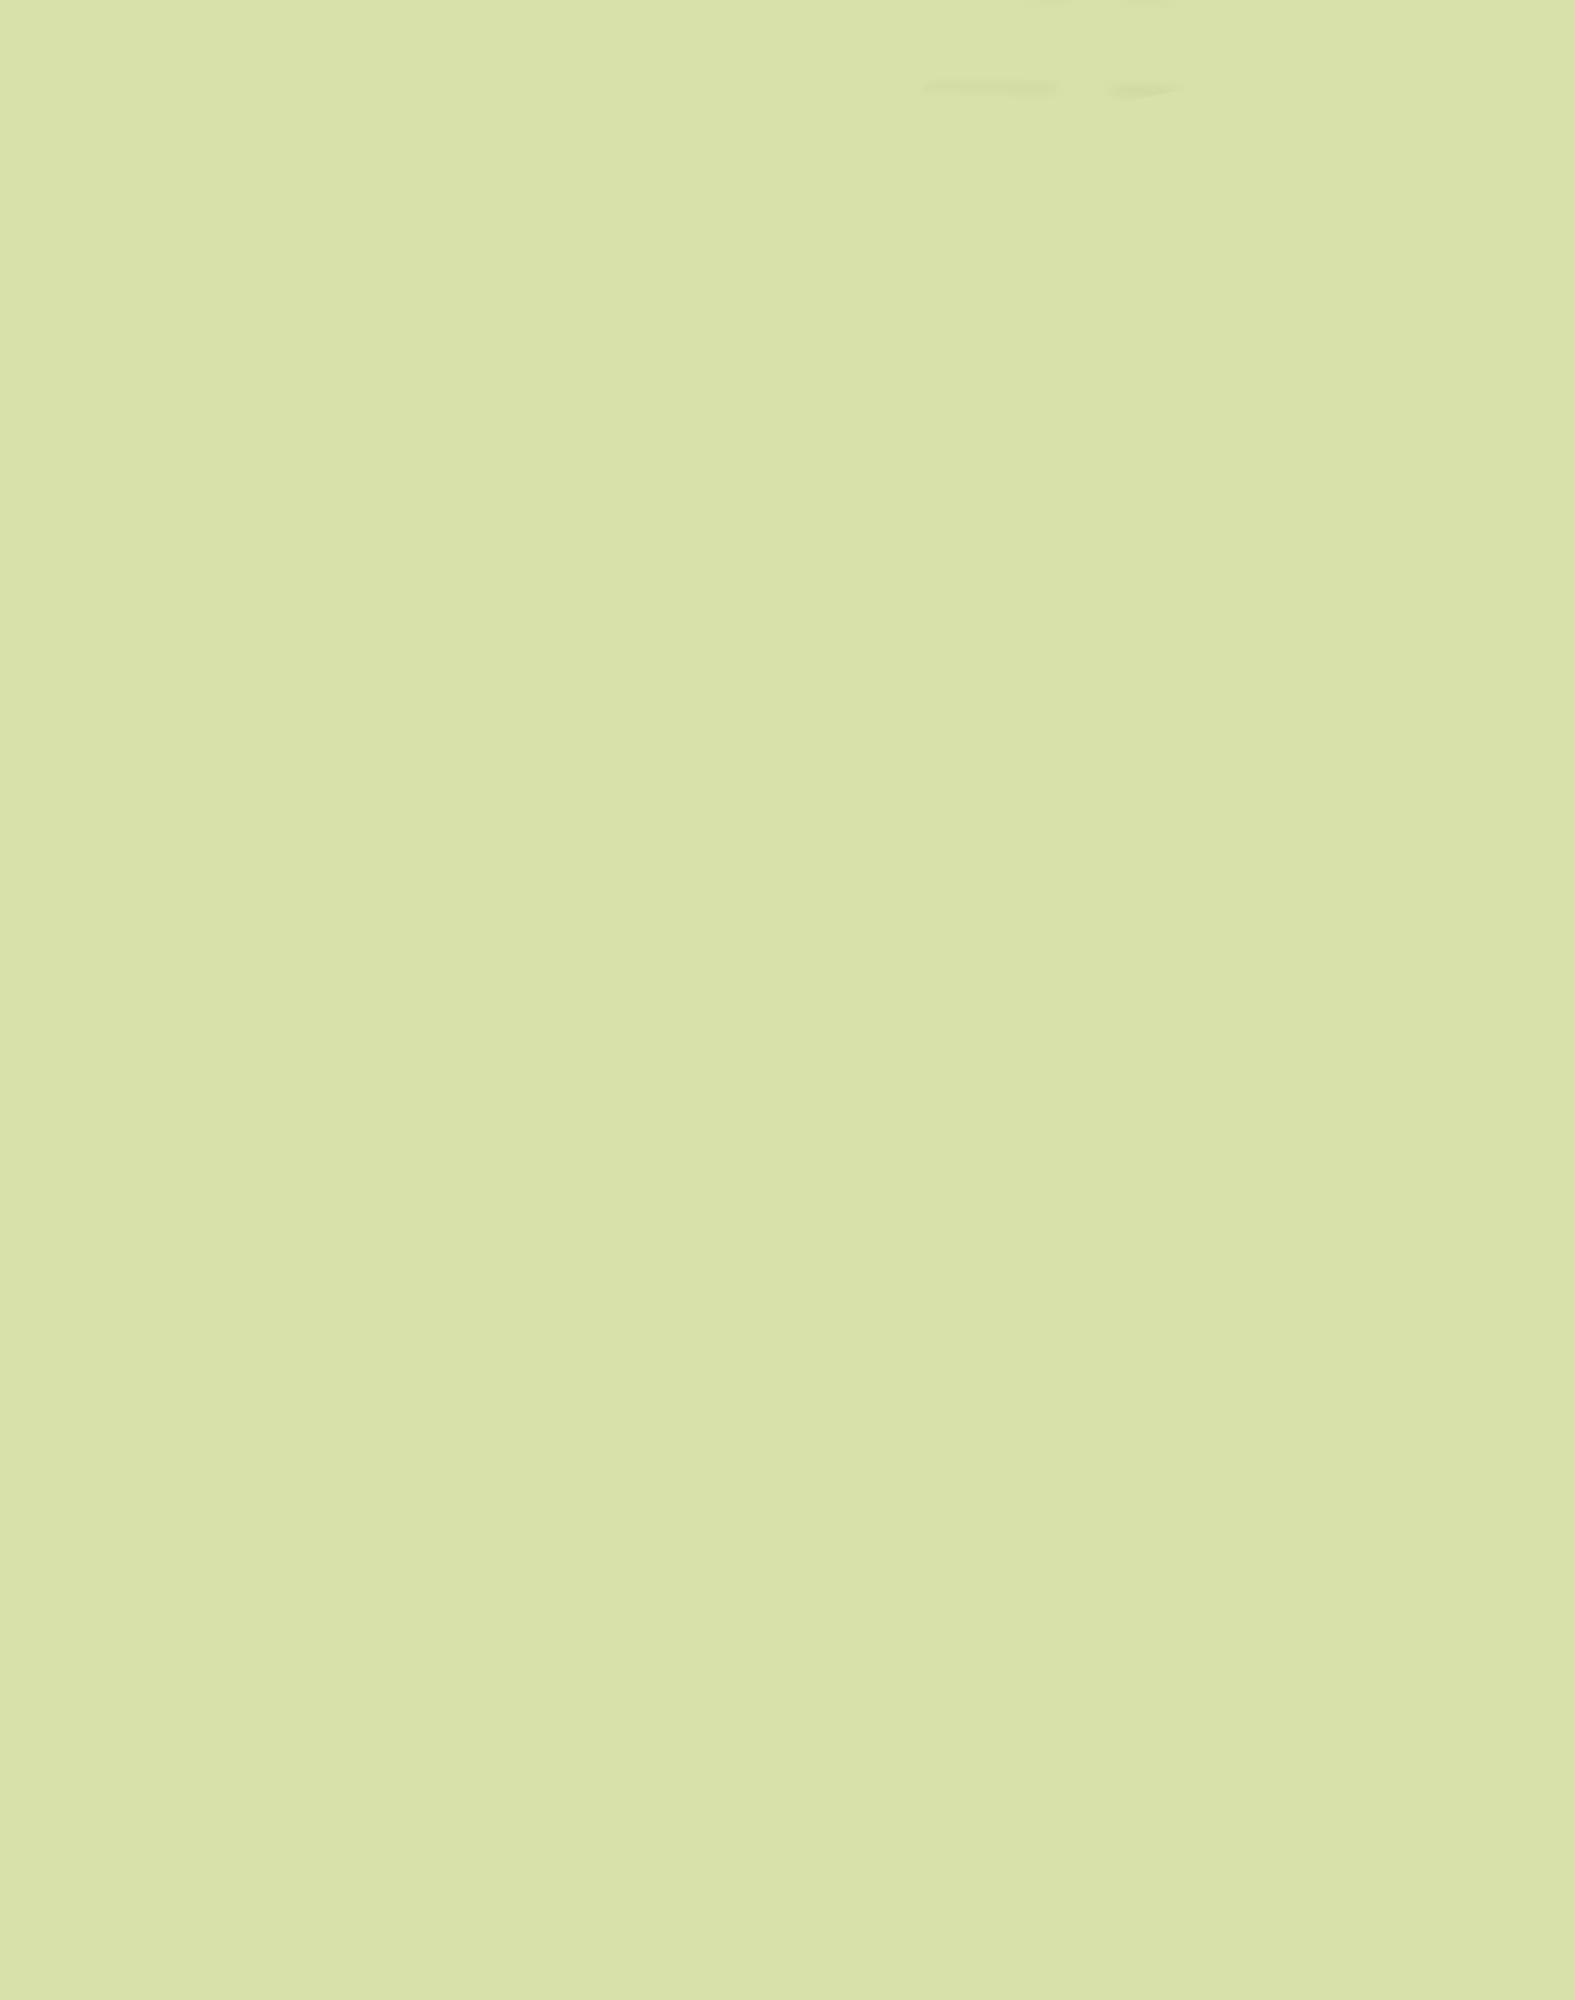 Lime Crush 216,225,169